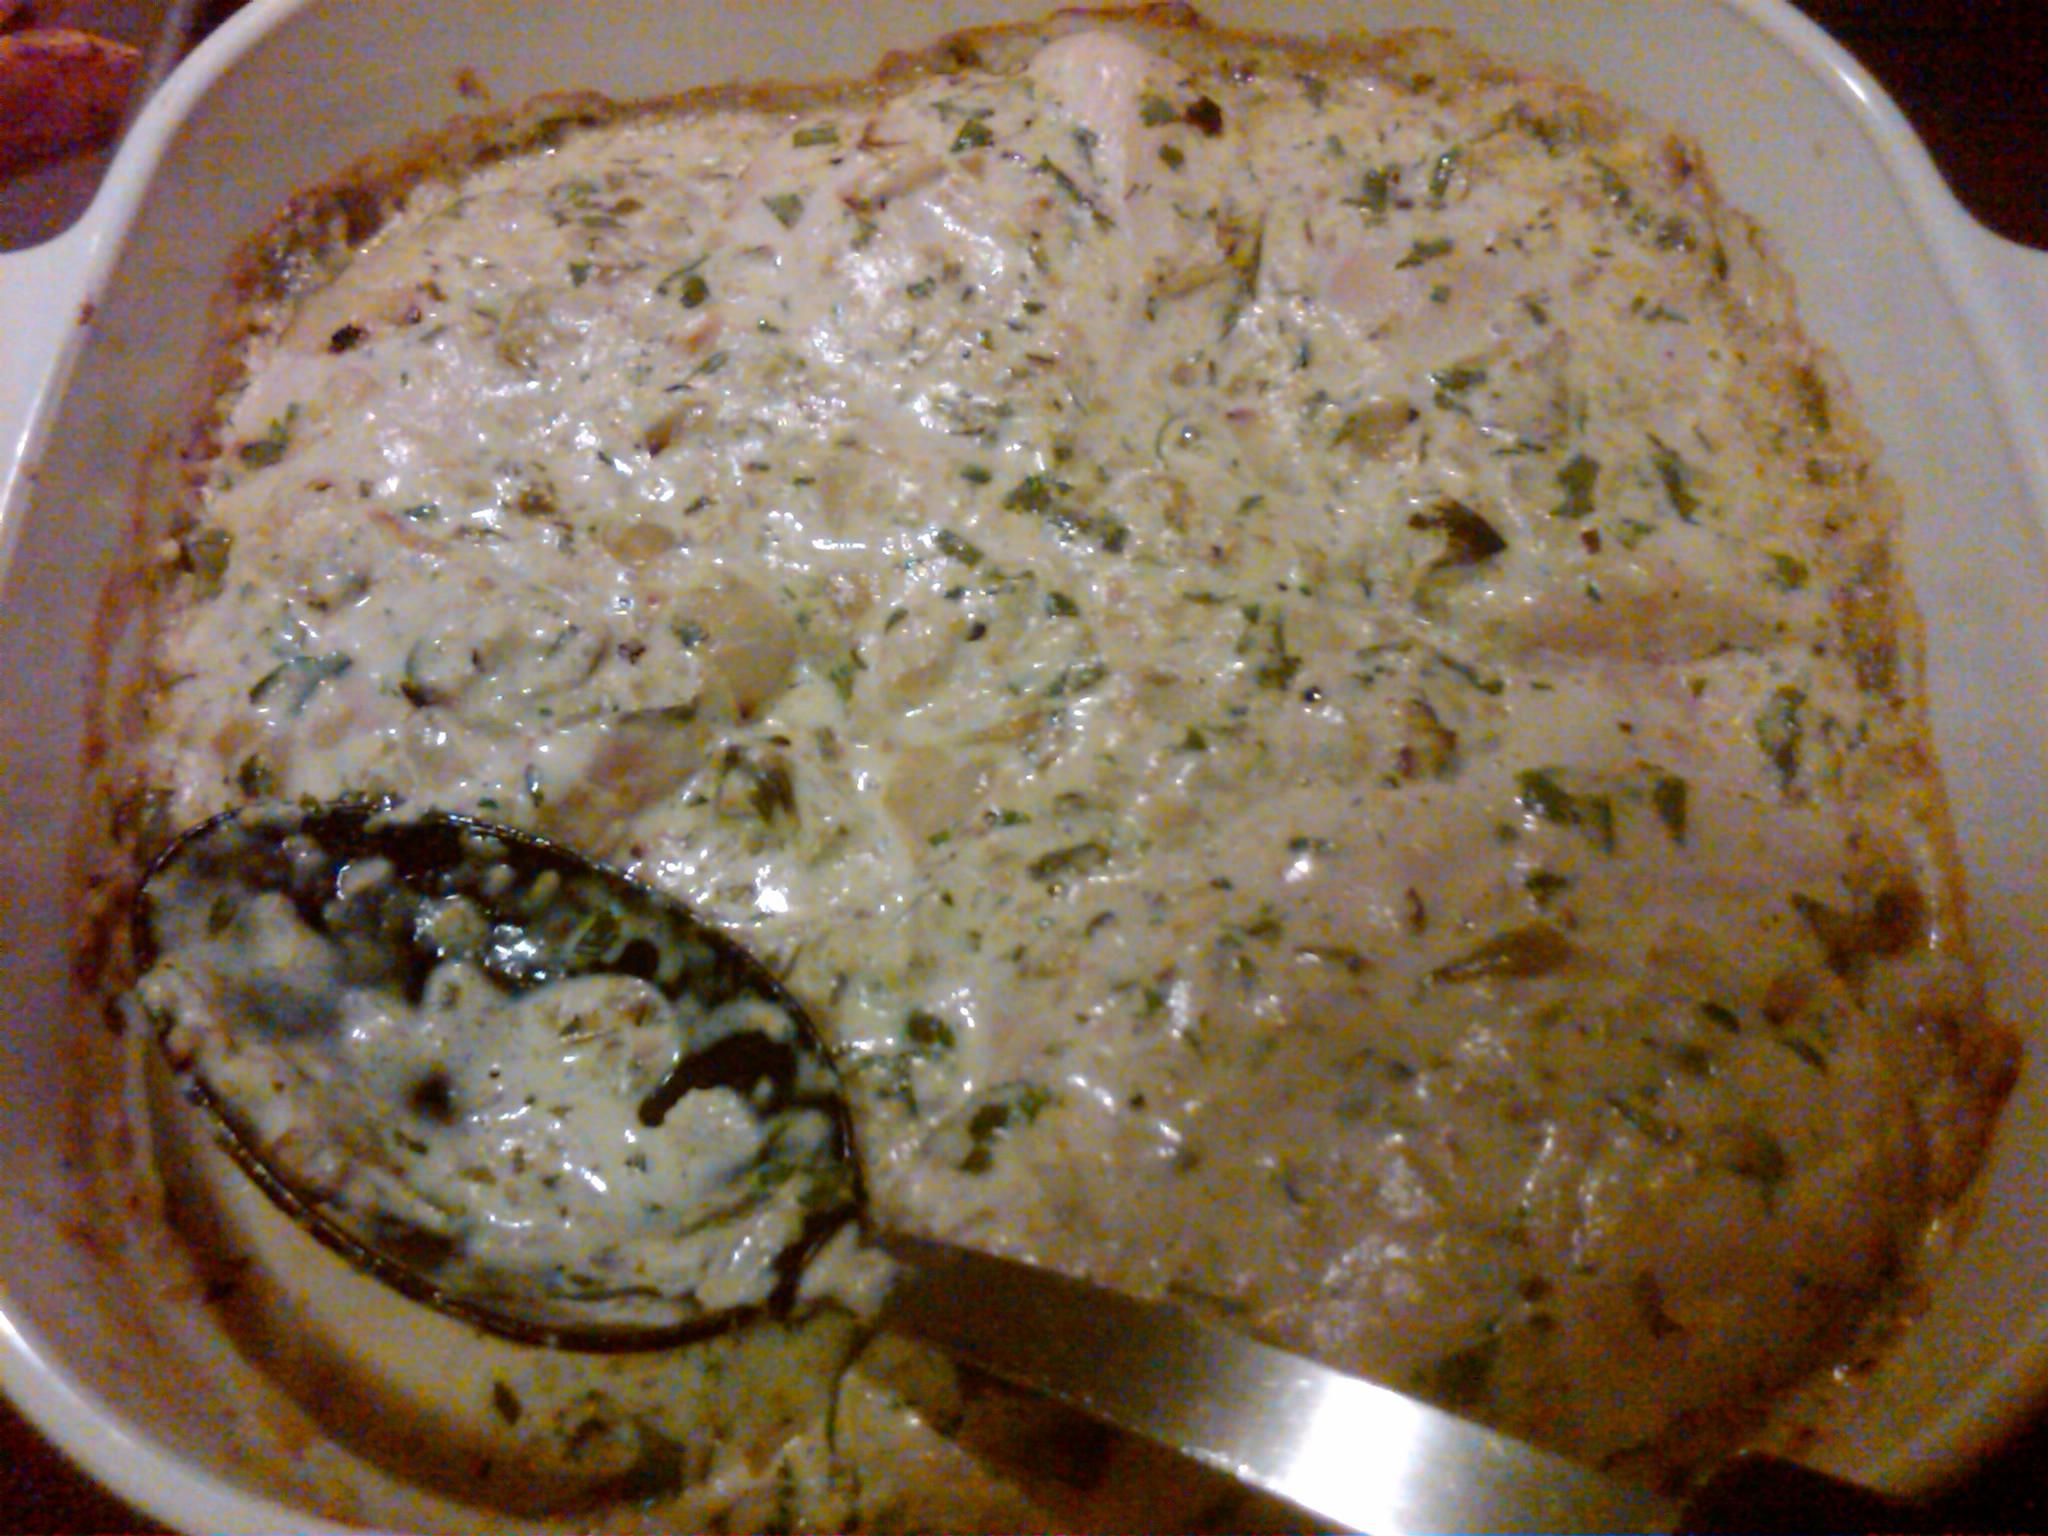 mexican bayless baked chicken tomatillo salsa cream sauce recipe